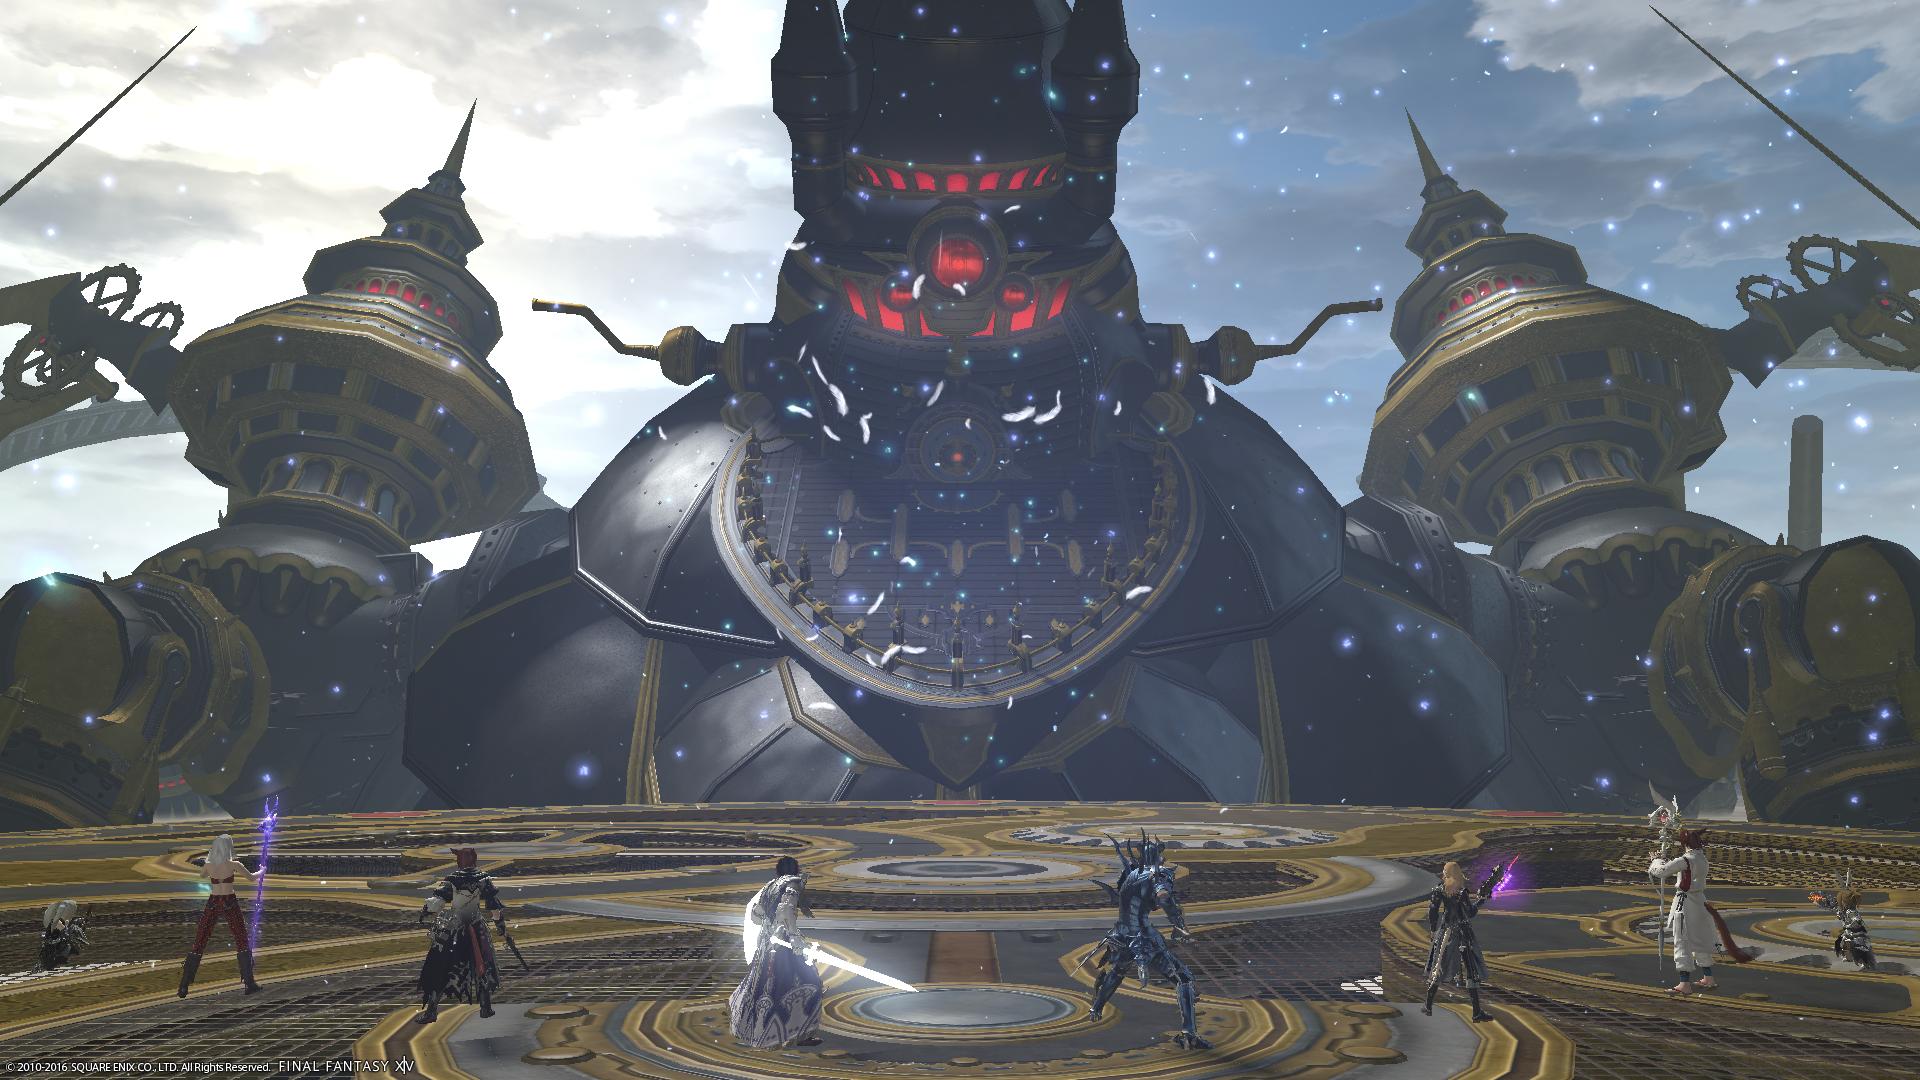 Uscita la patch 3.57 per Final Fantasy XIV!